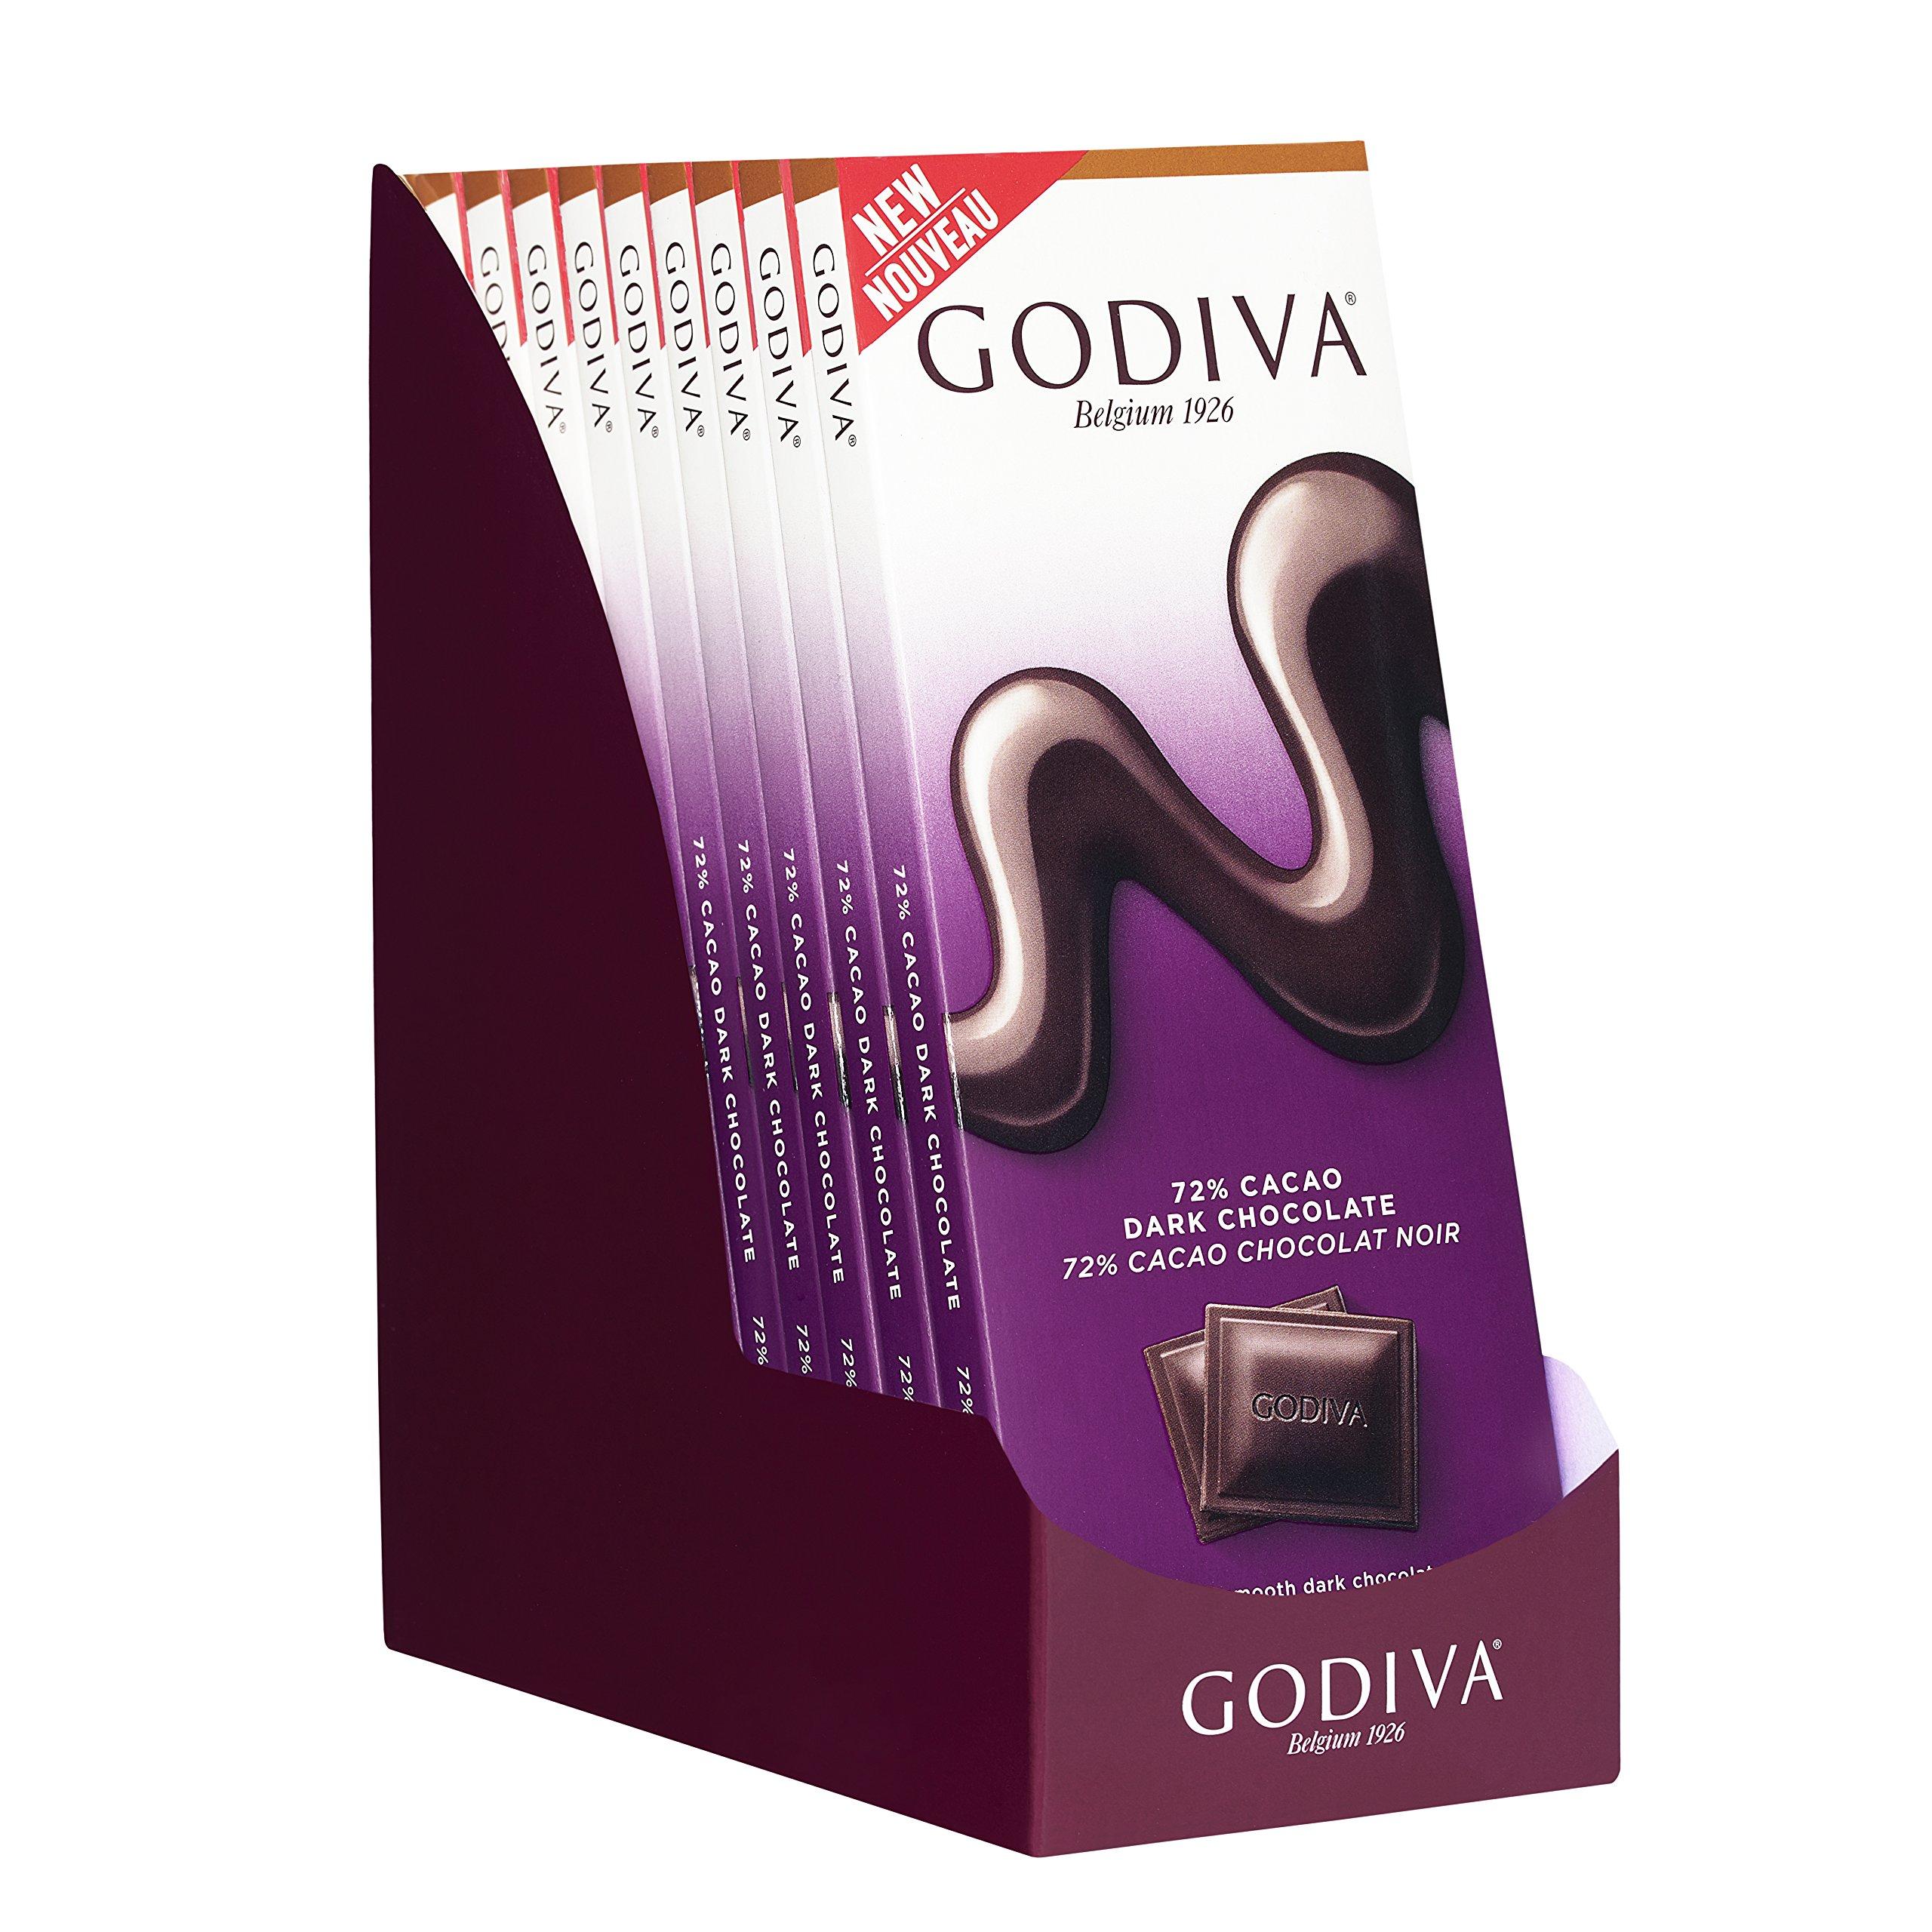 Amazon.com : Godiva Dark Chocolate Bar, 72%, 3.5-Ounces